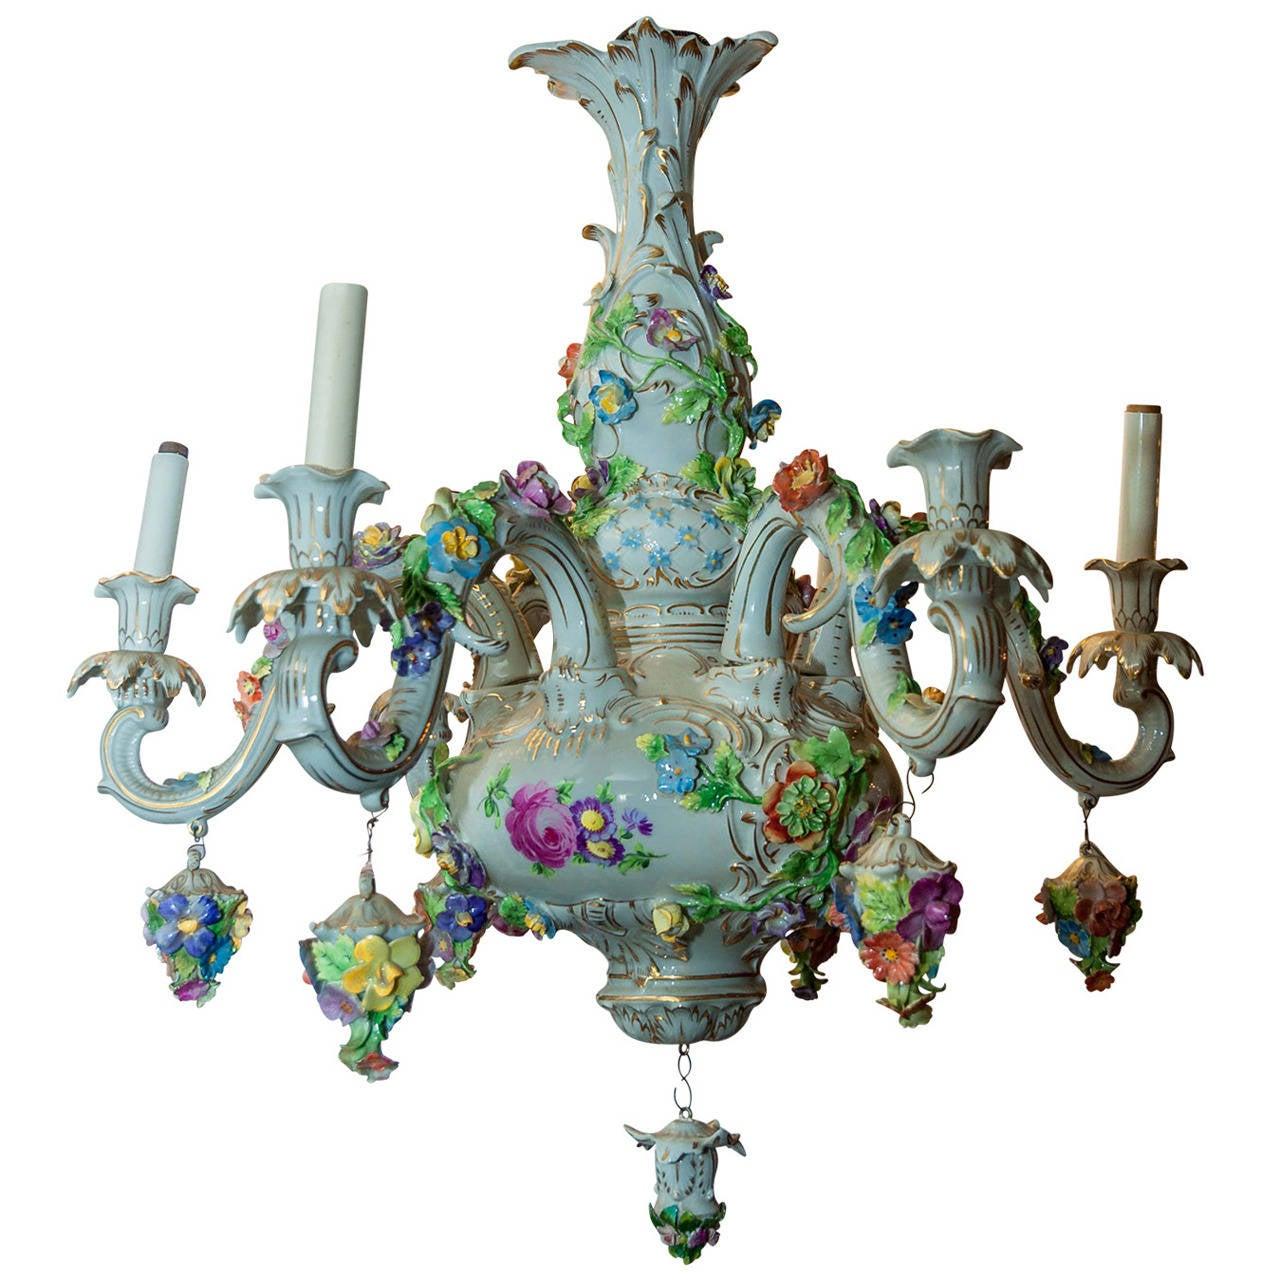 Dresden porcelain floral design six light figural cherub dresden porcelain floral design six light figural cherub chandelier 1 arubaitofo Images